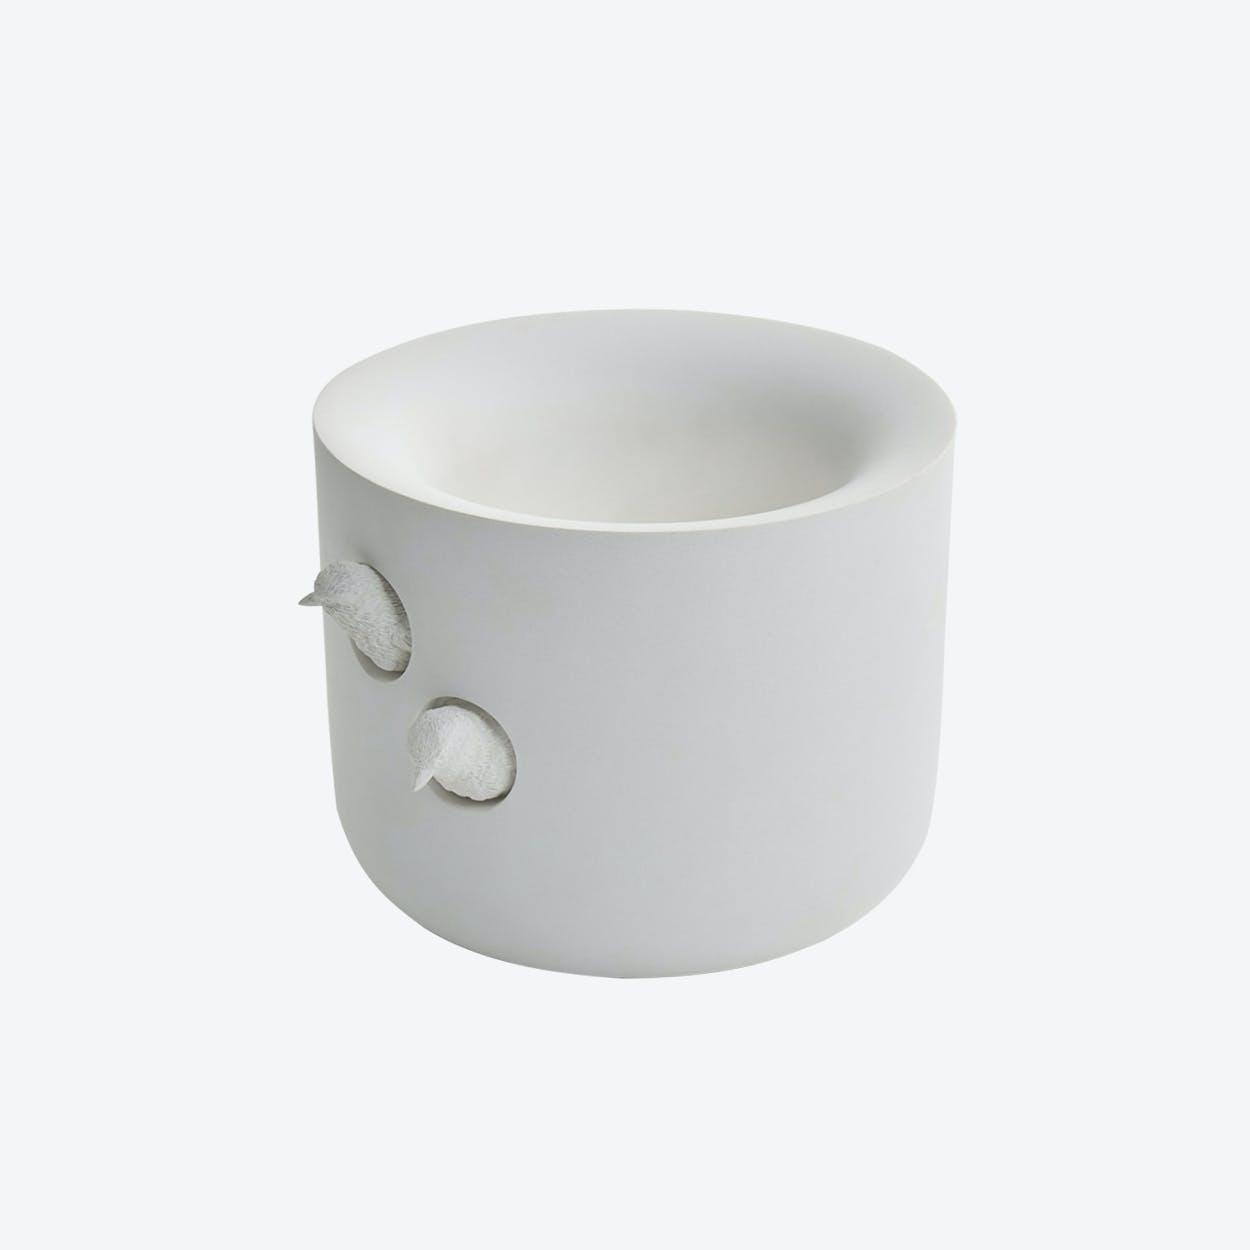 Sparrow Vase - Grand